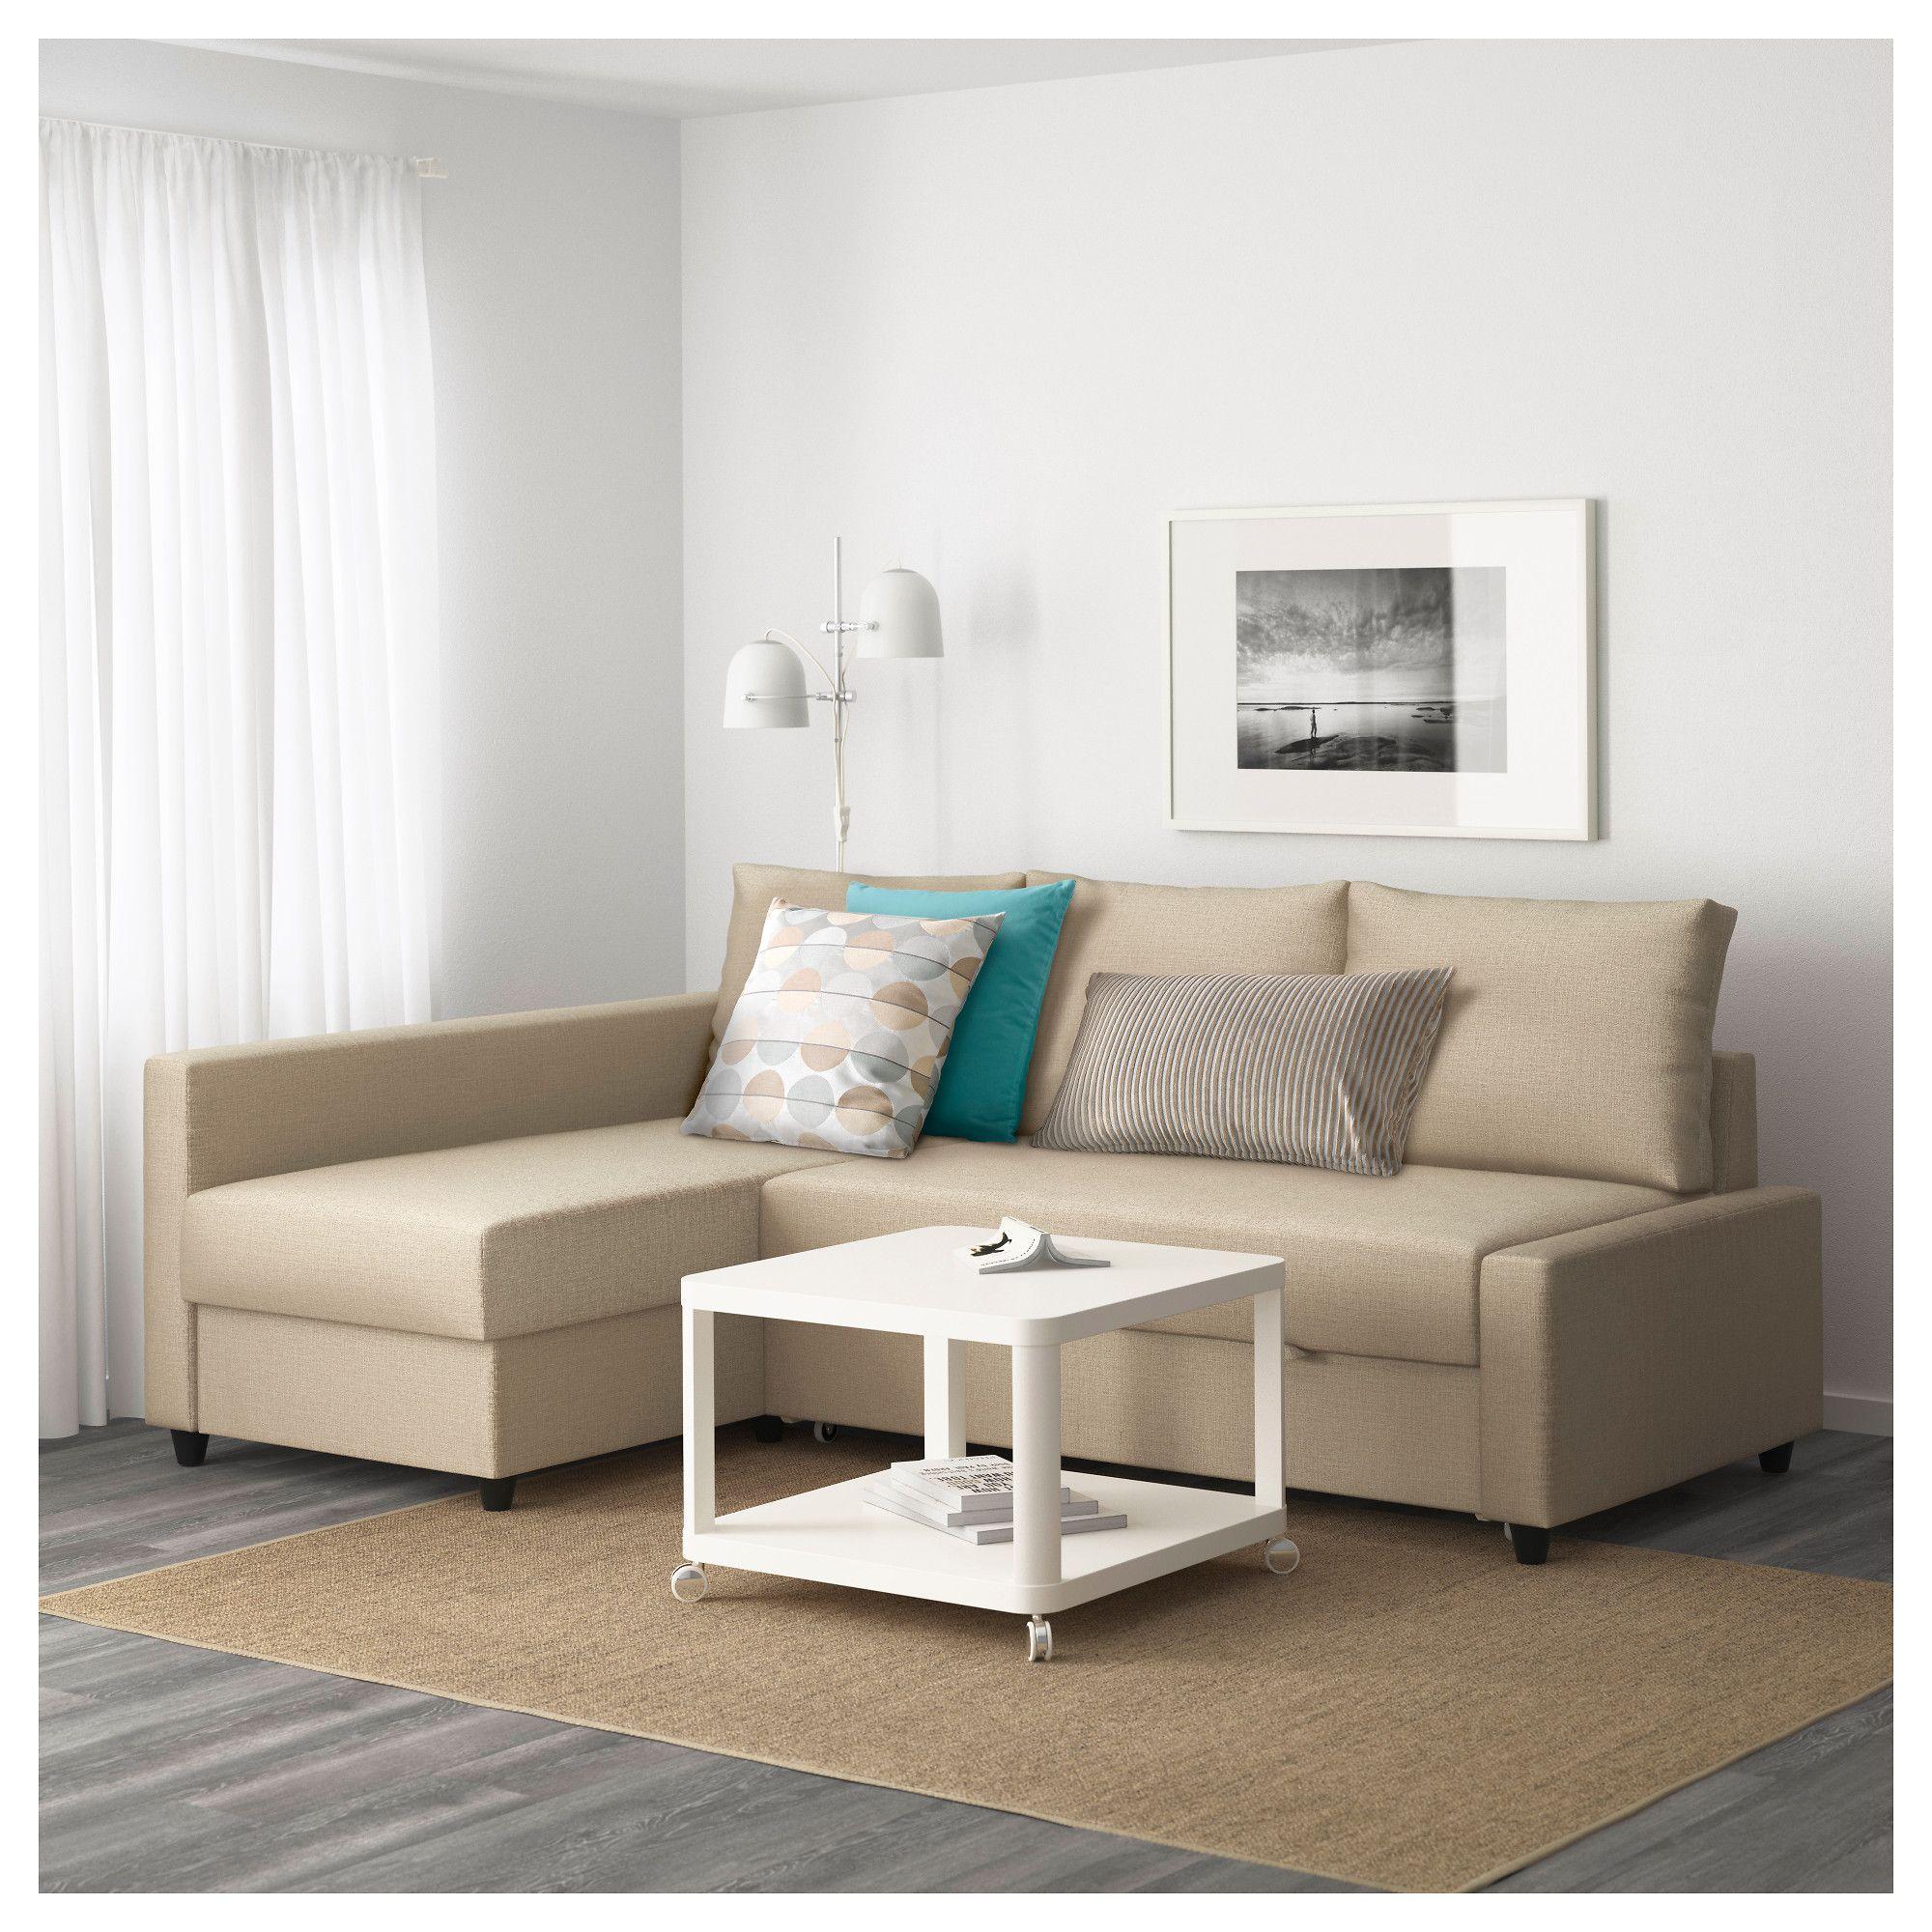 Ikea Friheten Corner Sofa Bed With Storage Skiftebo Beige Corner Sofa Bed With Storage Corner Sofa Bed Sofa Bed With Chaise